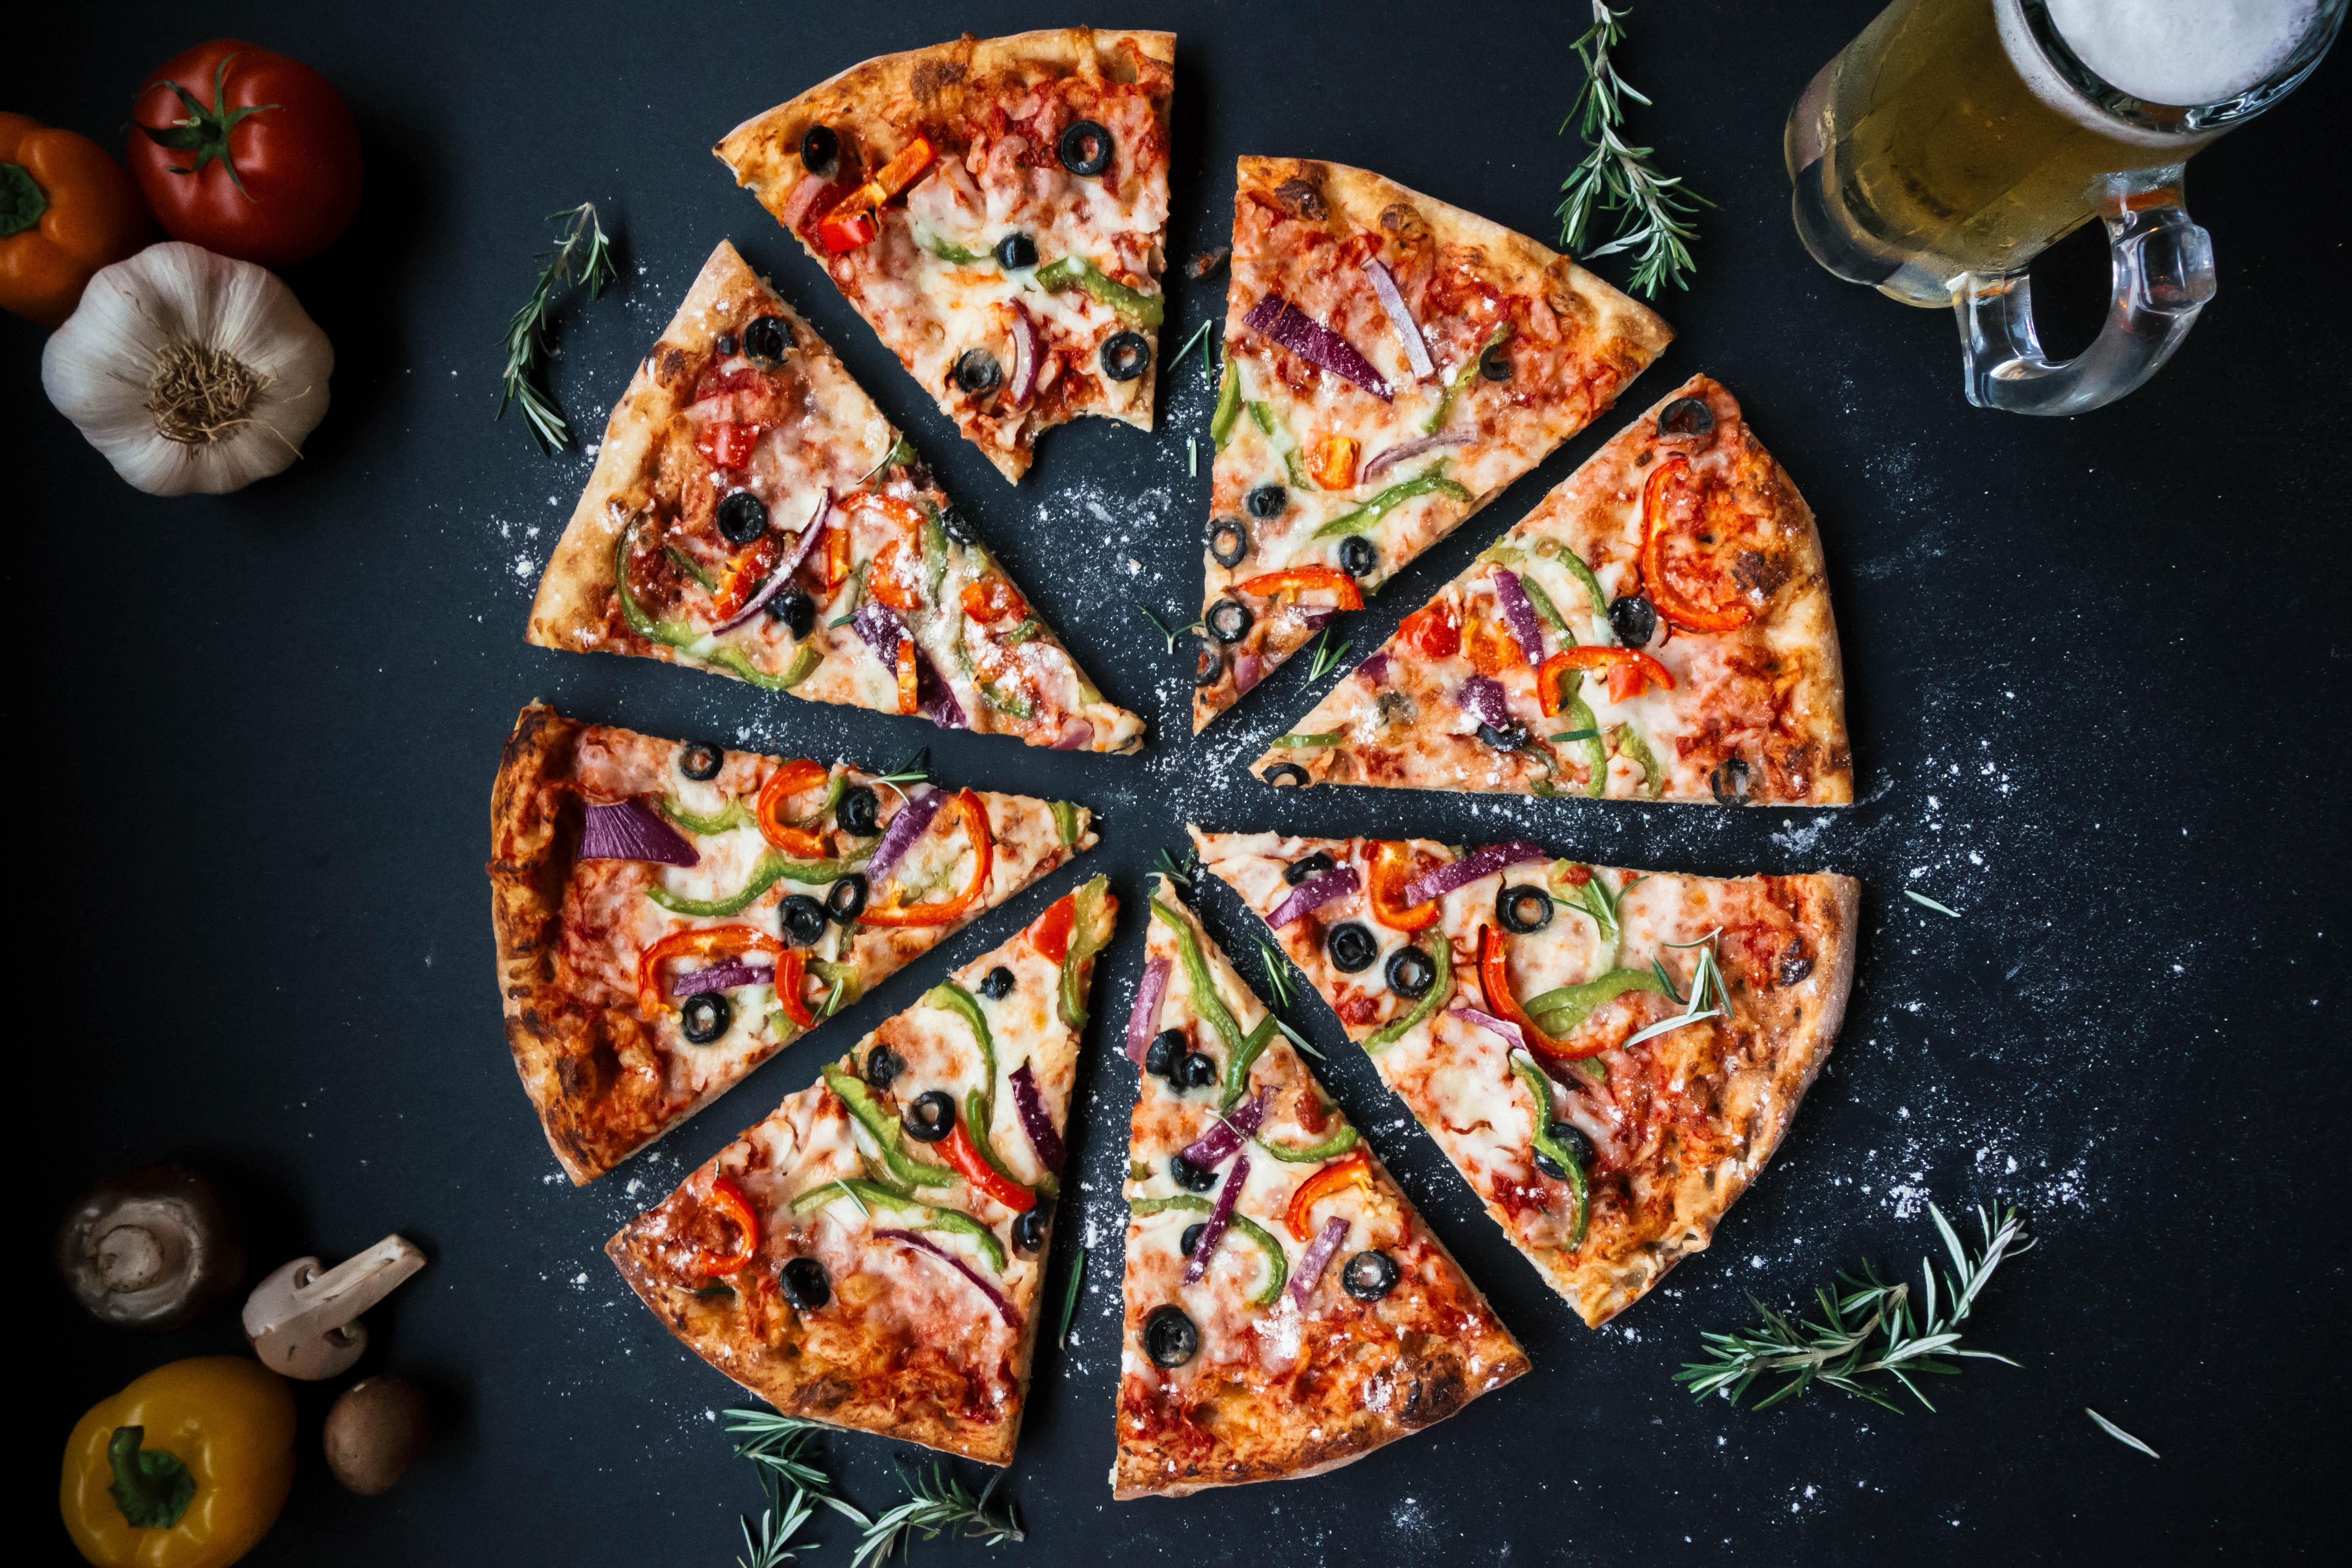 Healthy Personal Pizzas